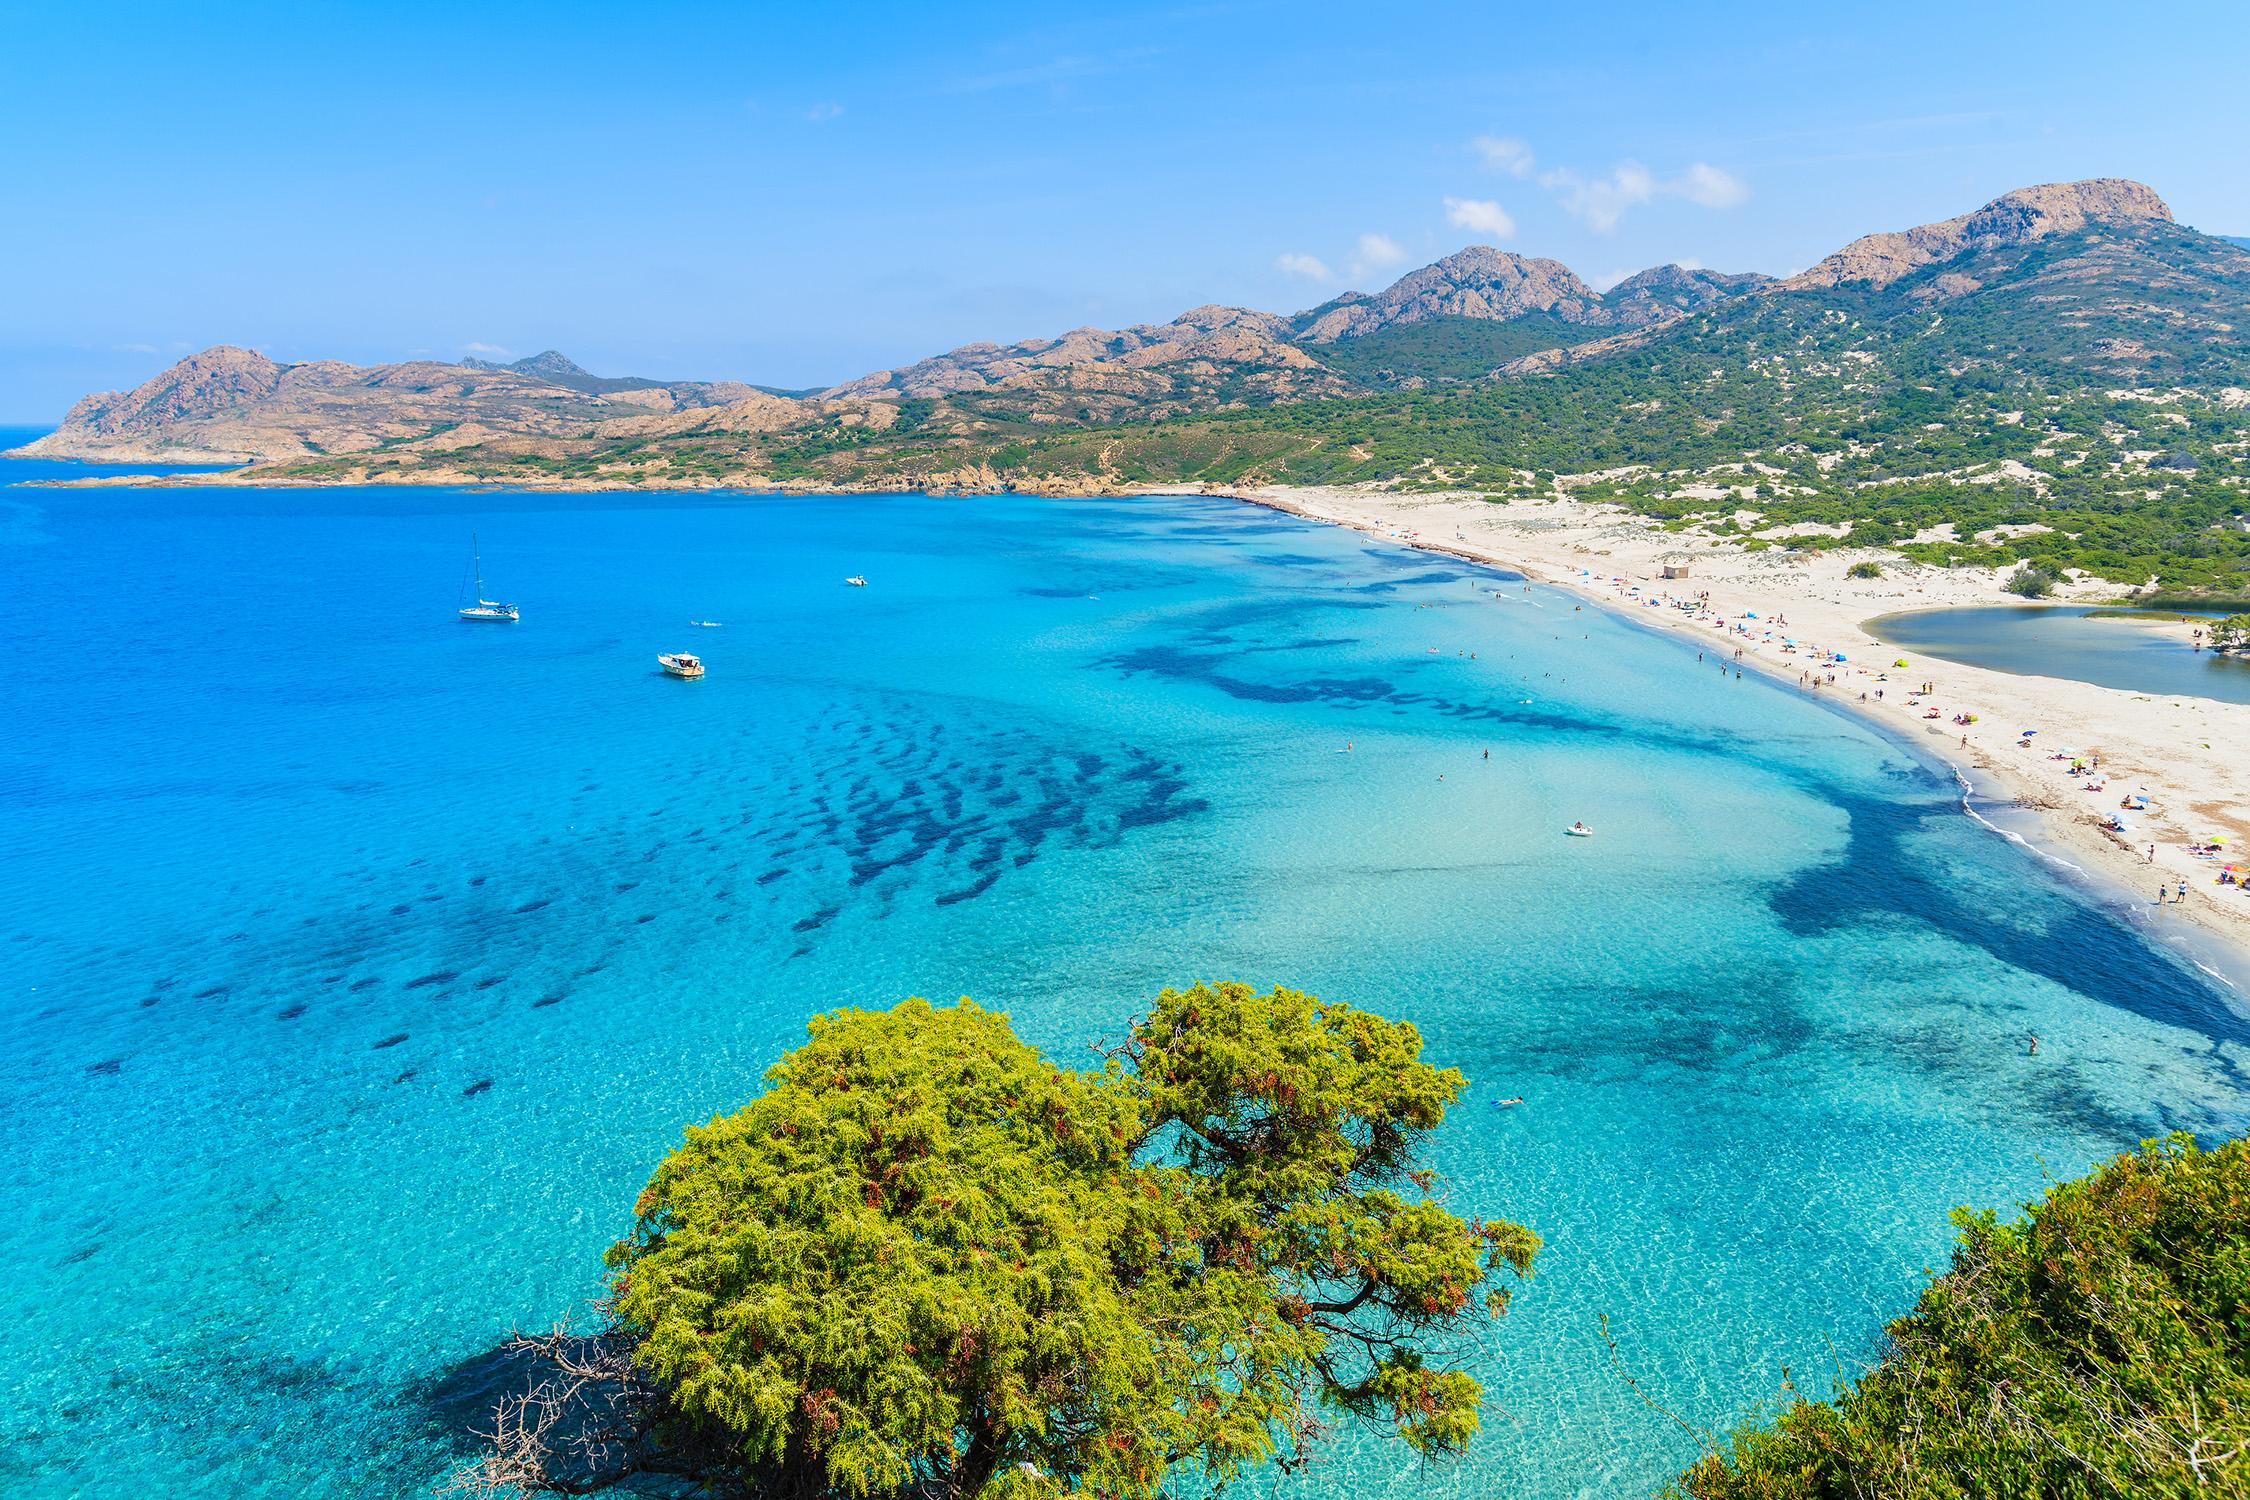 Tage Italien Meer Mit Flug Und Hotel